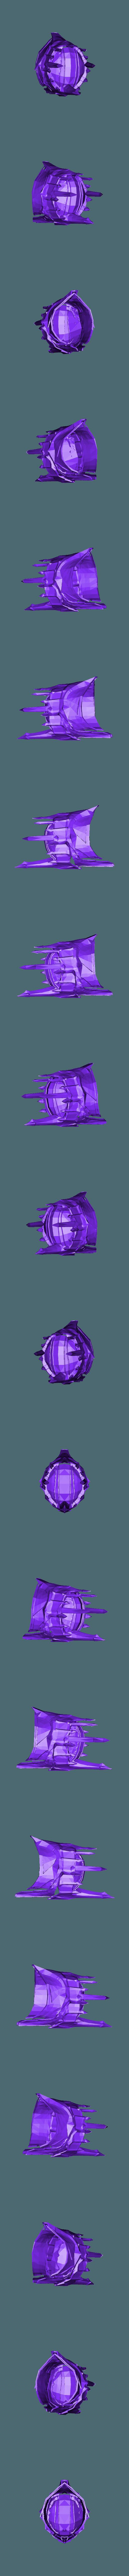 Sauron_Armor-_Helmet.stl Download free STL file Sauron Armor - Helmet • 3D printable template, arifsethi